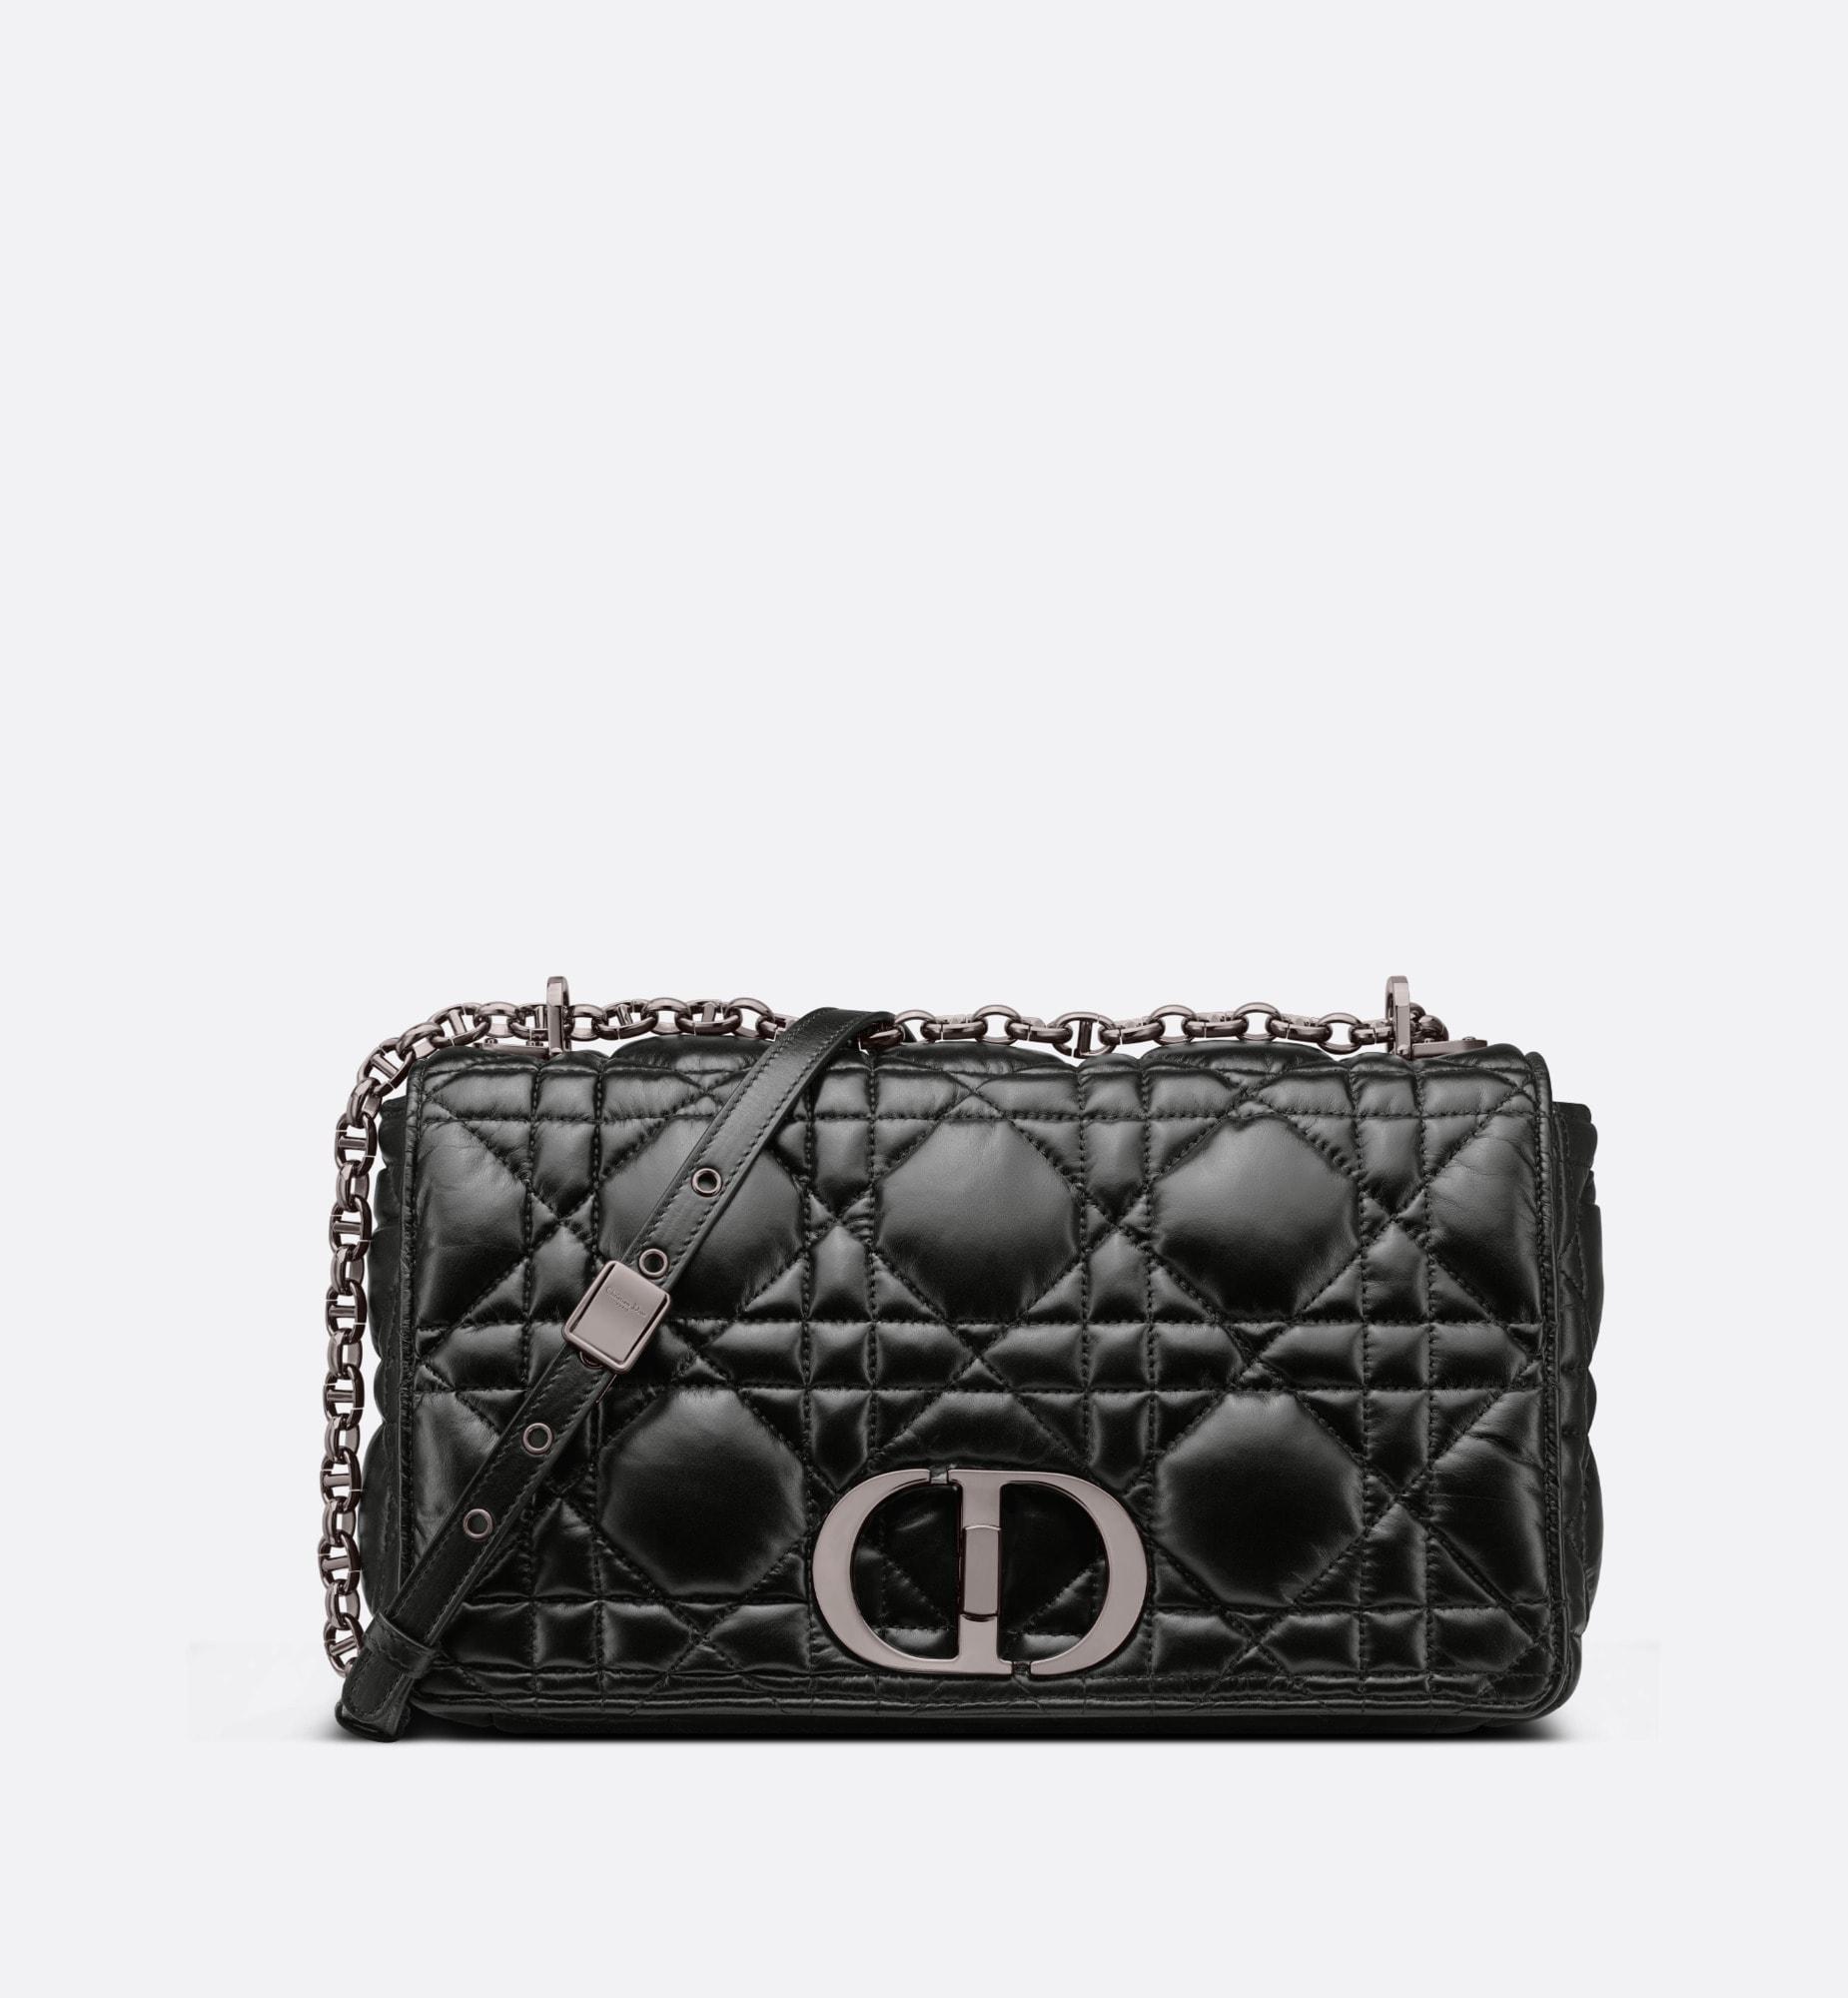 large dior caro bag | Dior Front view